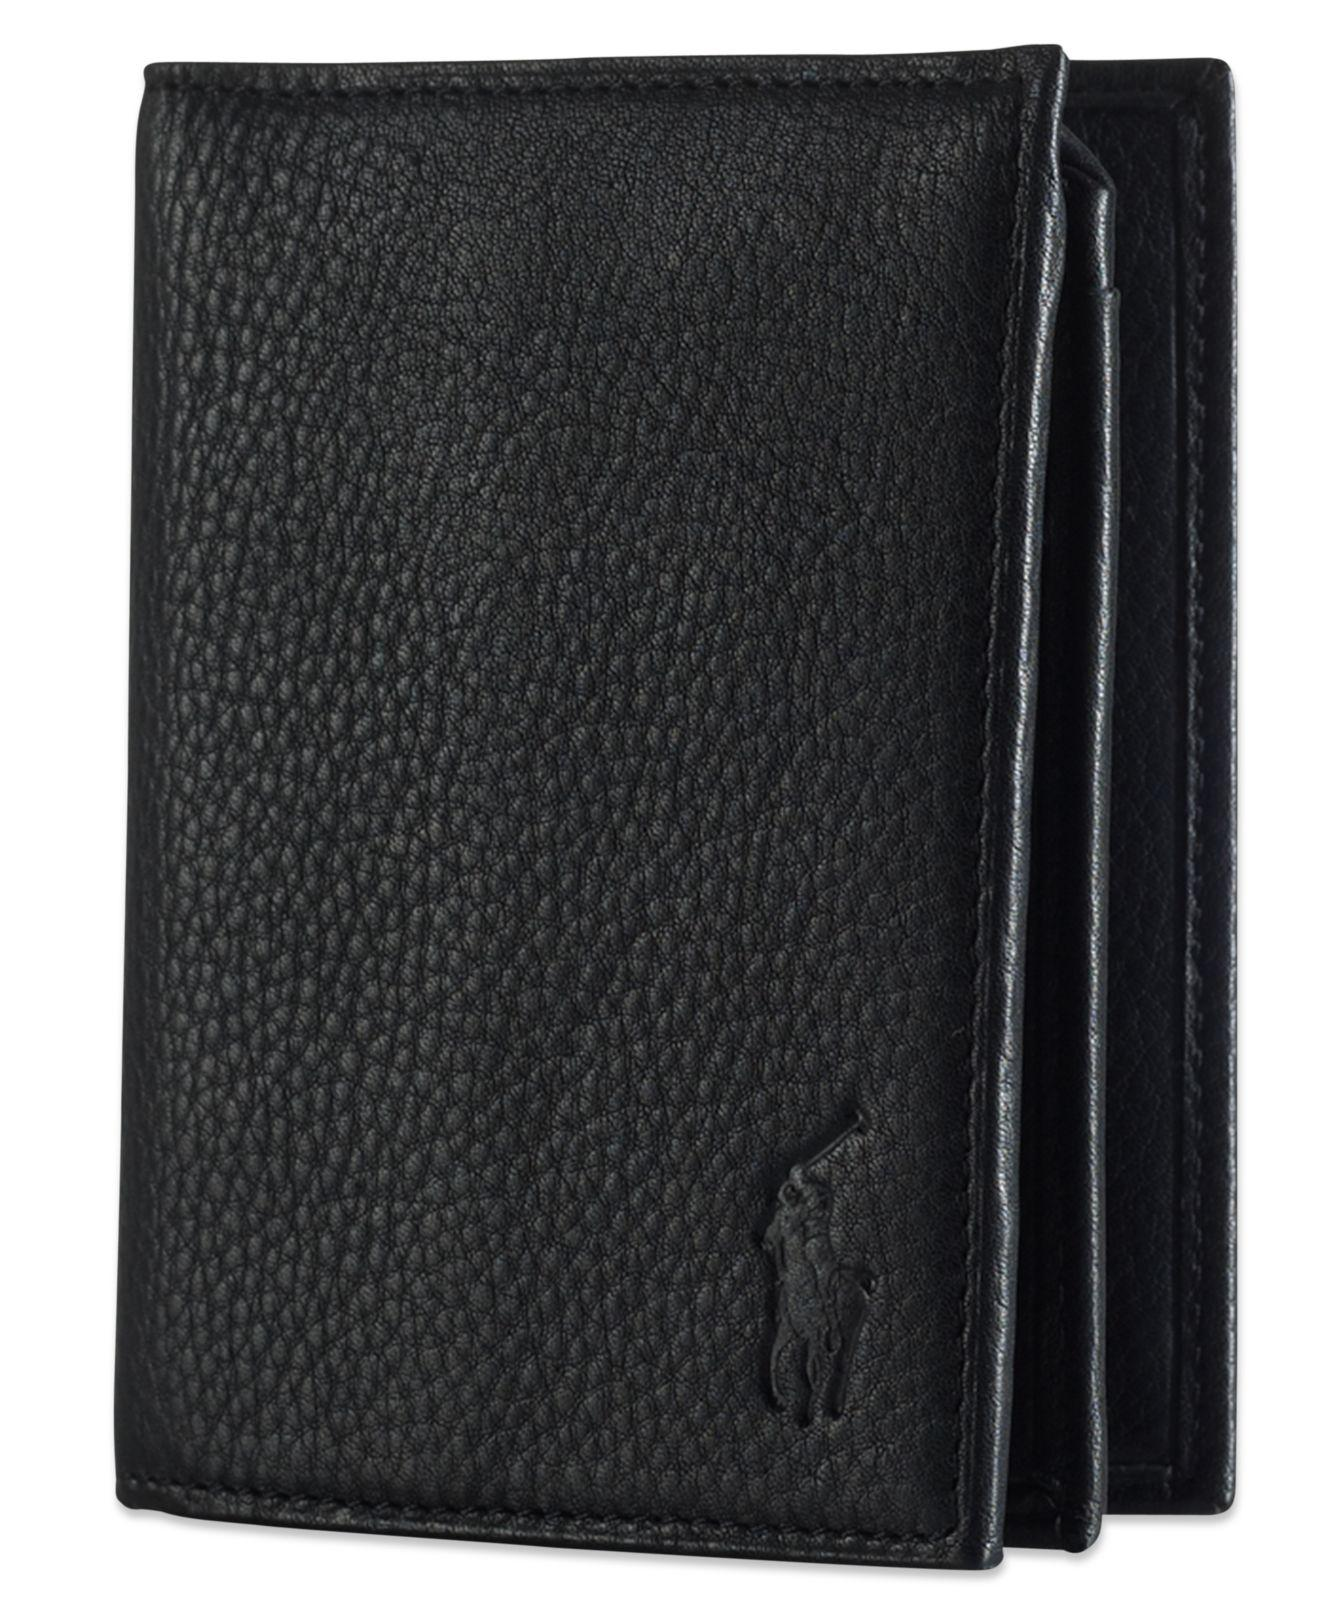 d6b16140c9 Ralph Lauren Wallets For Men - Best Photo Wallet Justiceforkenny.Org